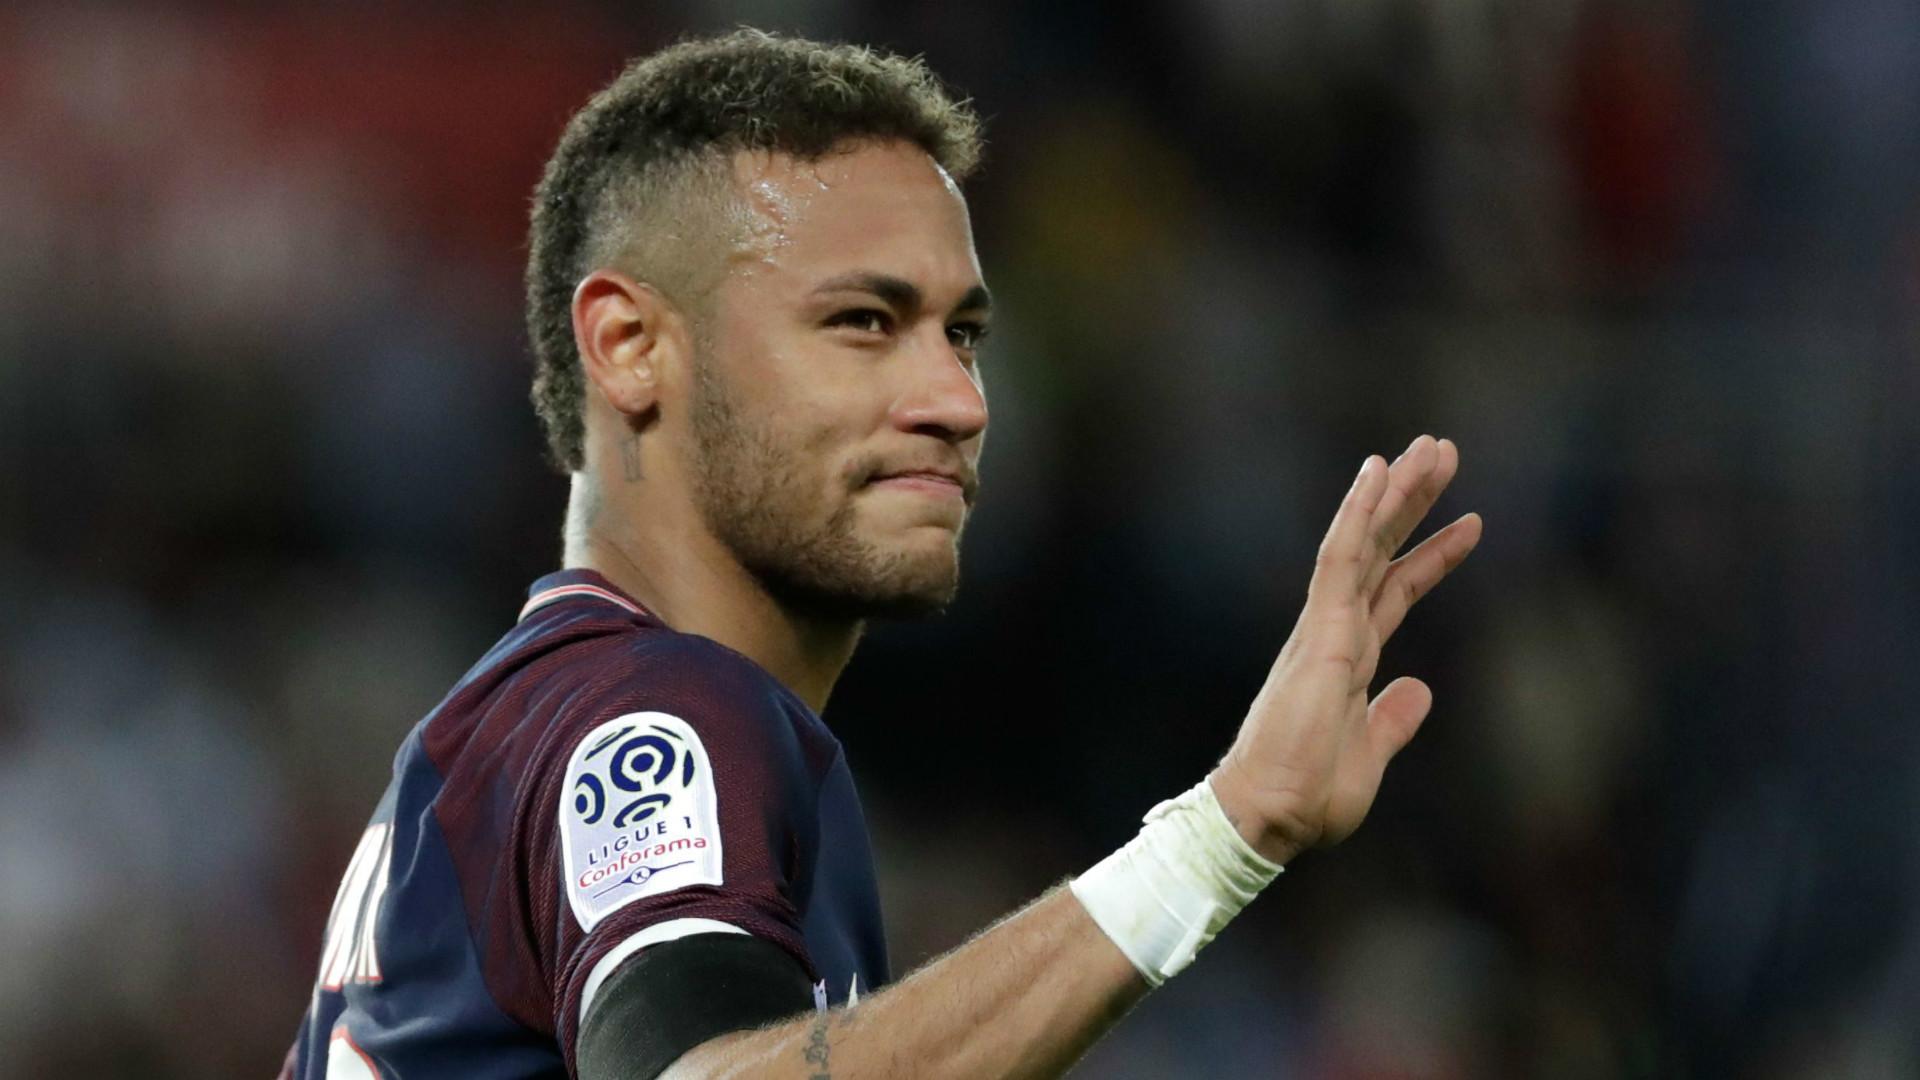 Hd Images Of Neymar: Neymar Wallpaper HD 2018 (82+ Images